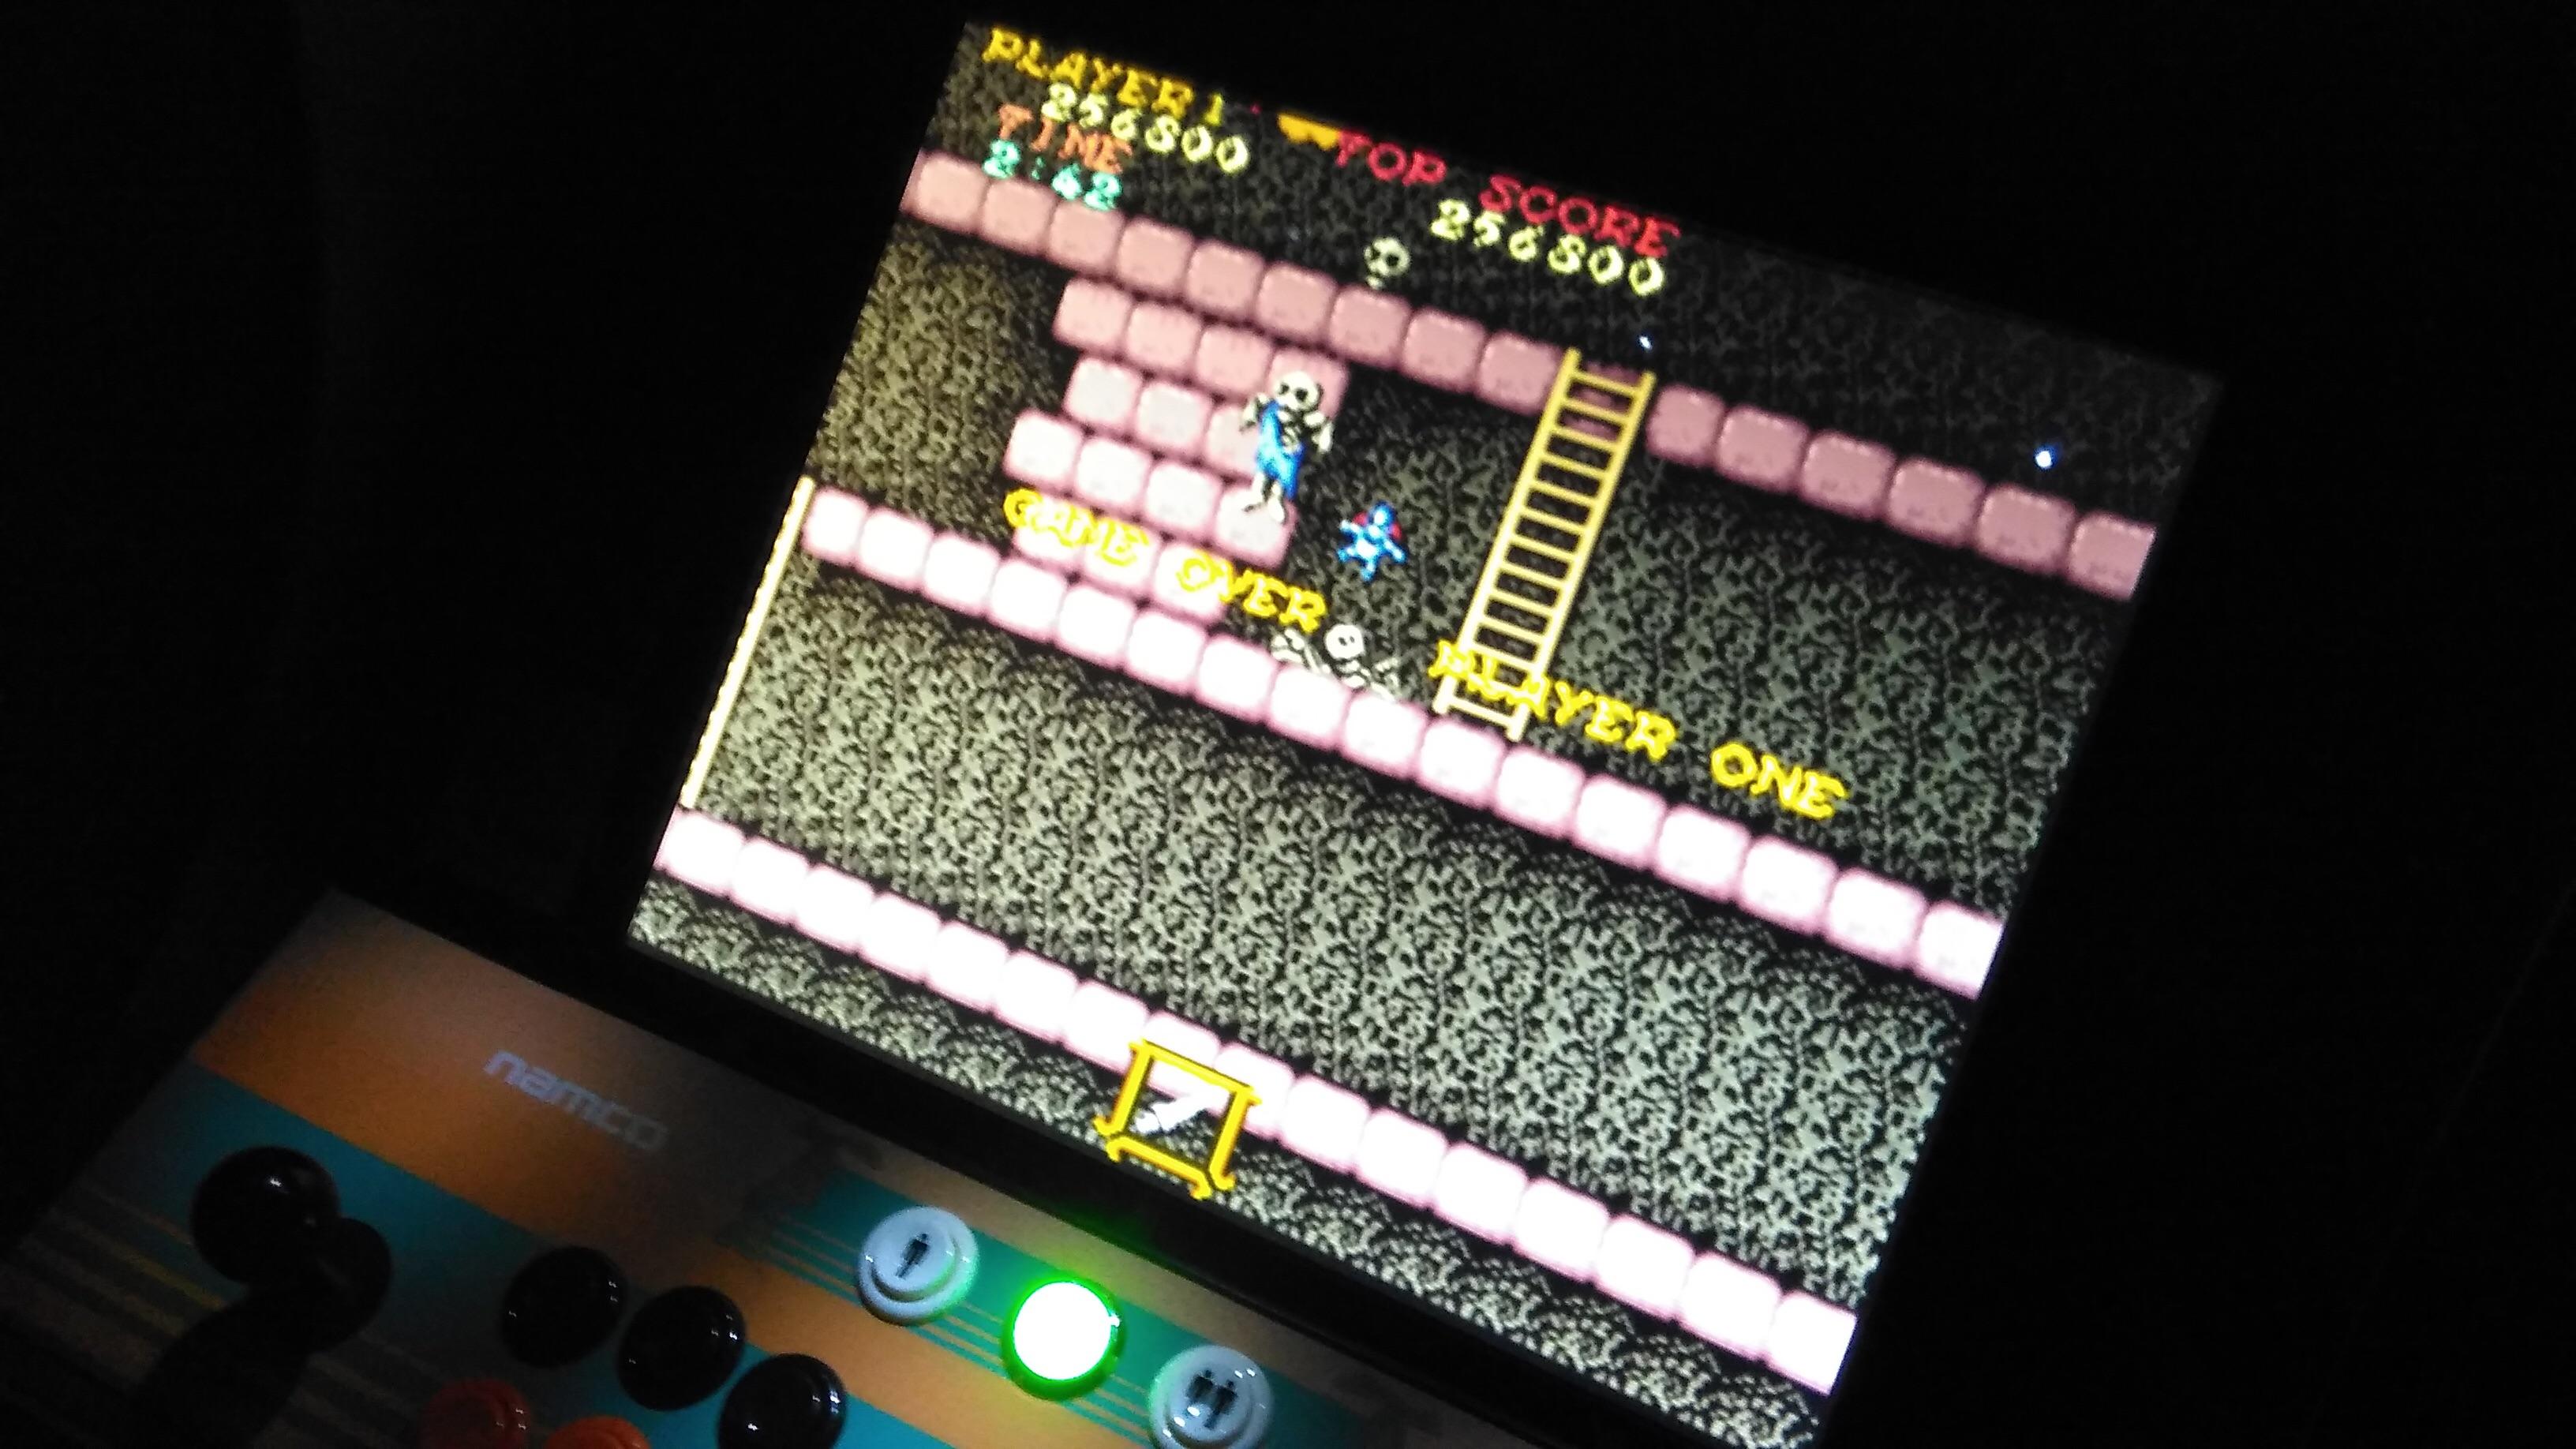 minirecreativas: Ghosts N Goblins (Arcade Emulated / M.A.M.E.) 256,800 points on 2015-02-14 07:33:34